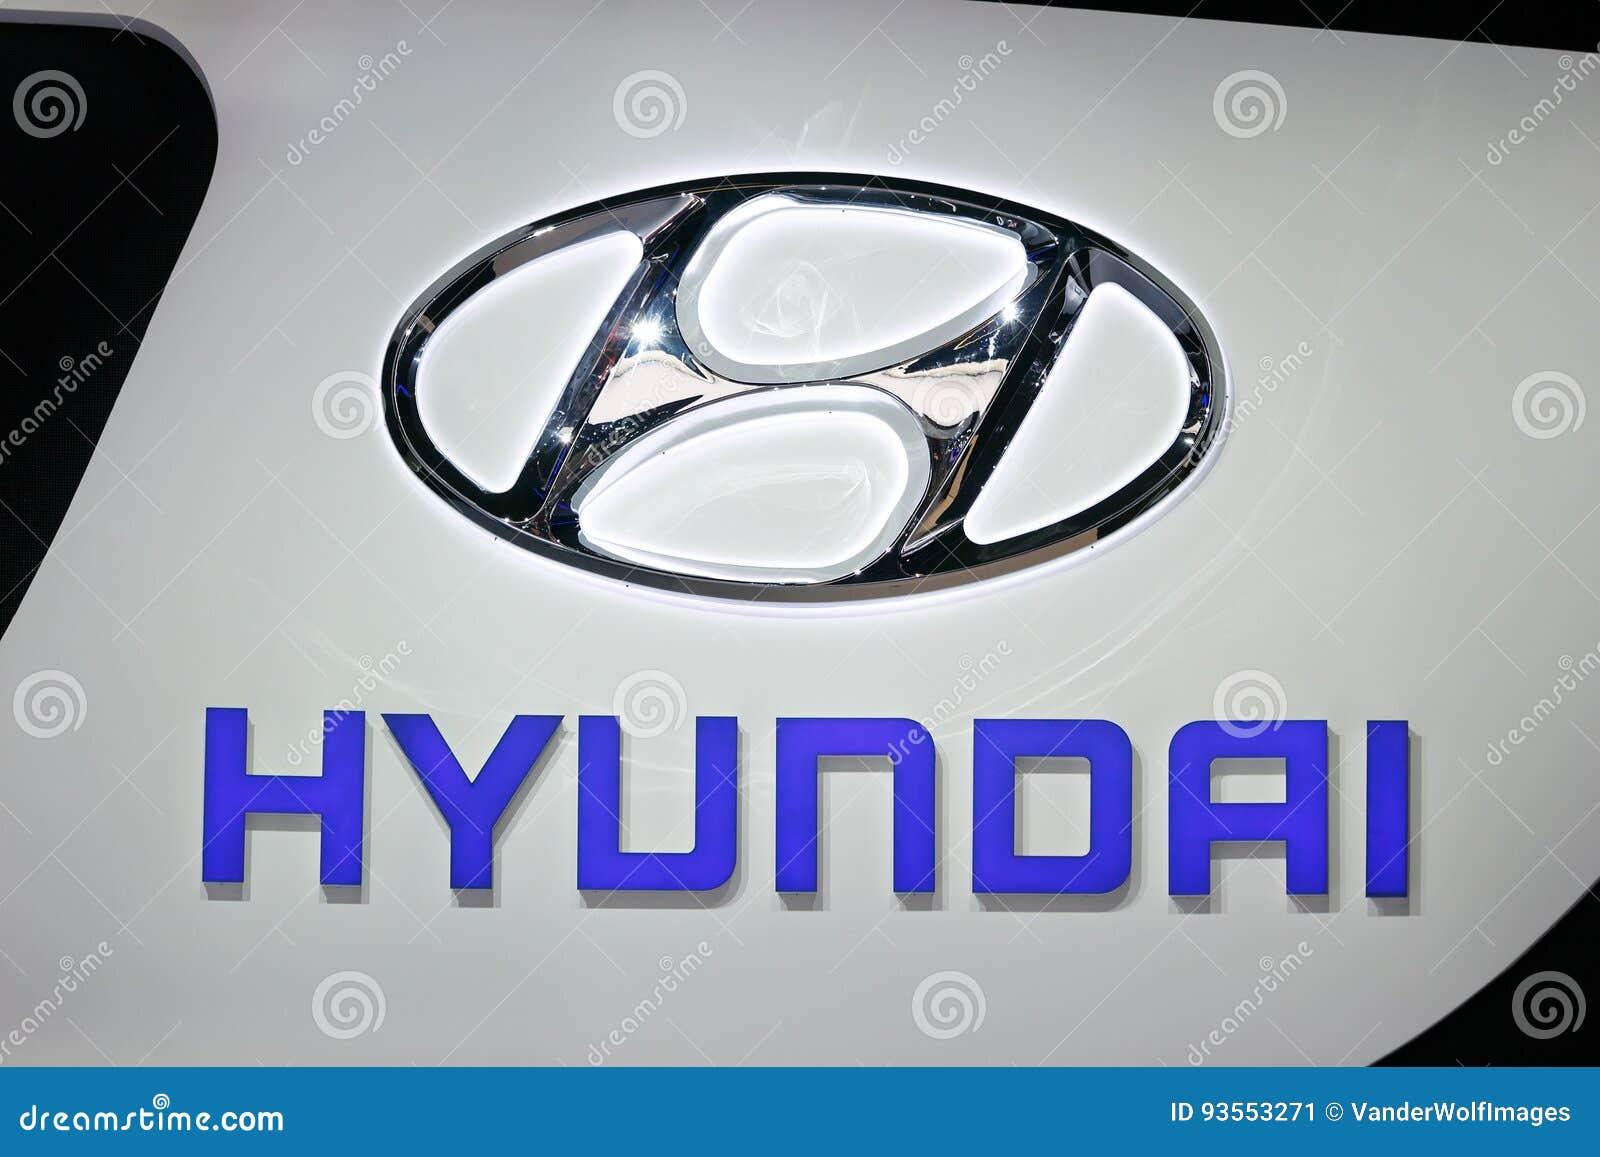 Hyundai Car Sign Editorial Photo Image Of Motorshow 93553271